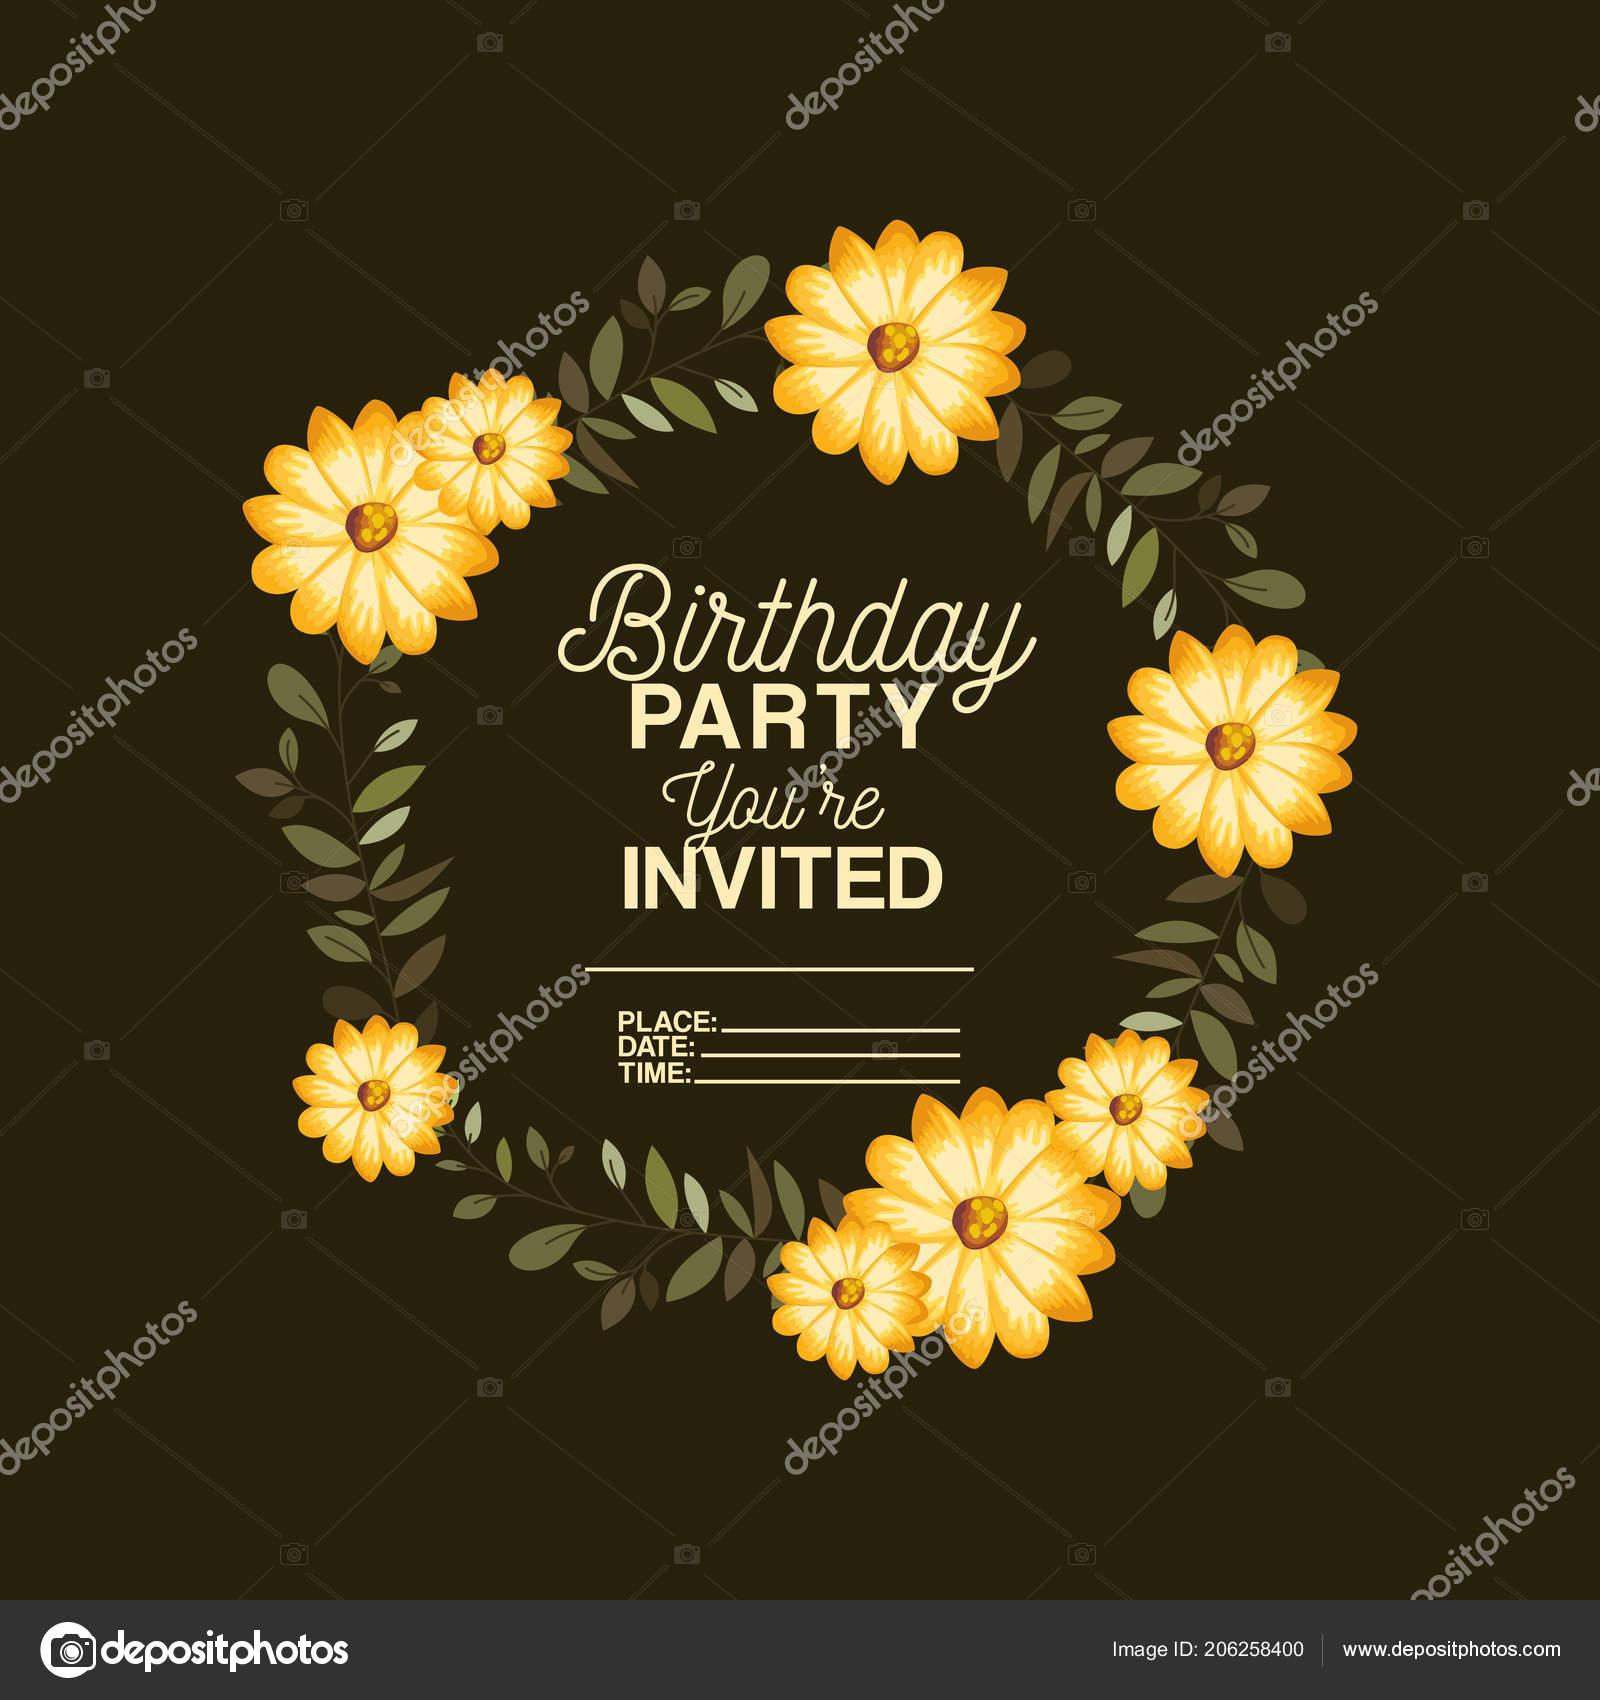 Birthday Party Invitation With Floral Decoration Stockvektor